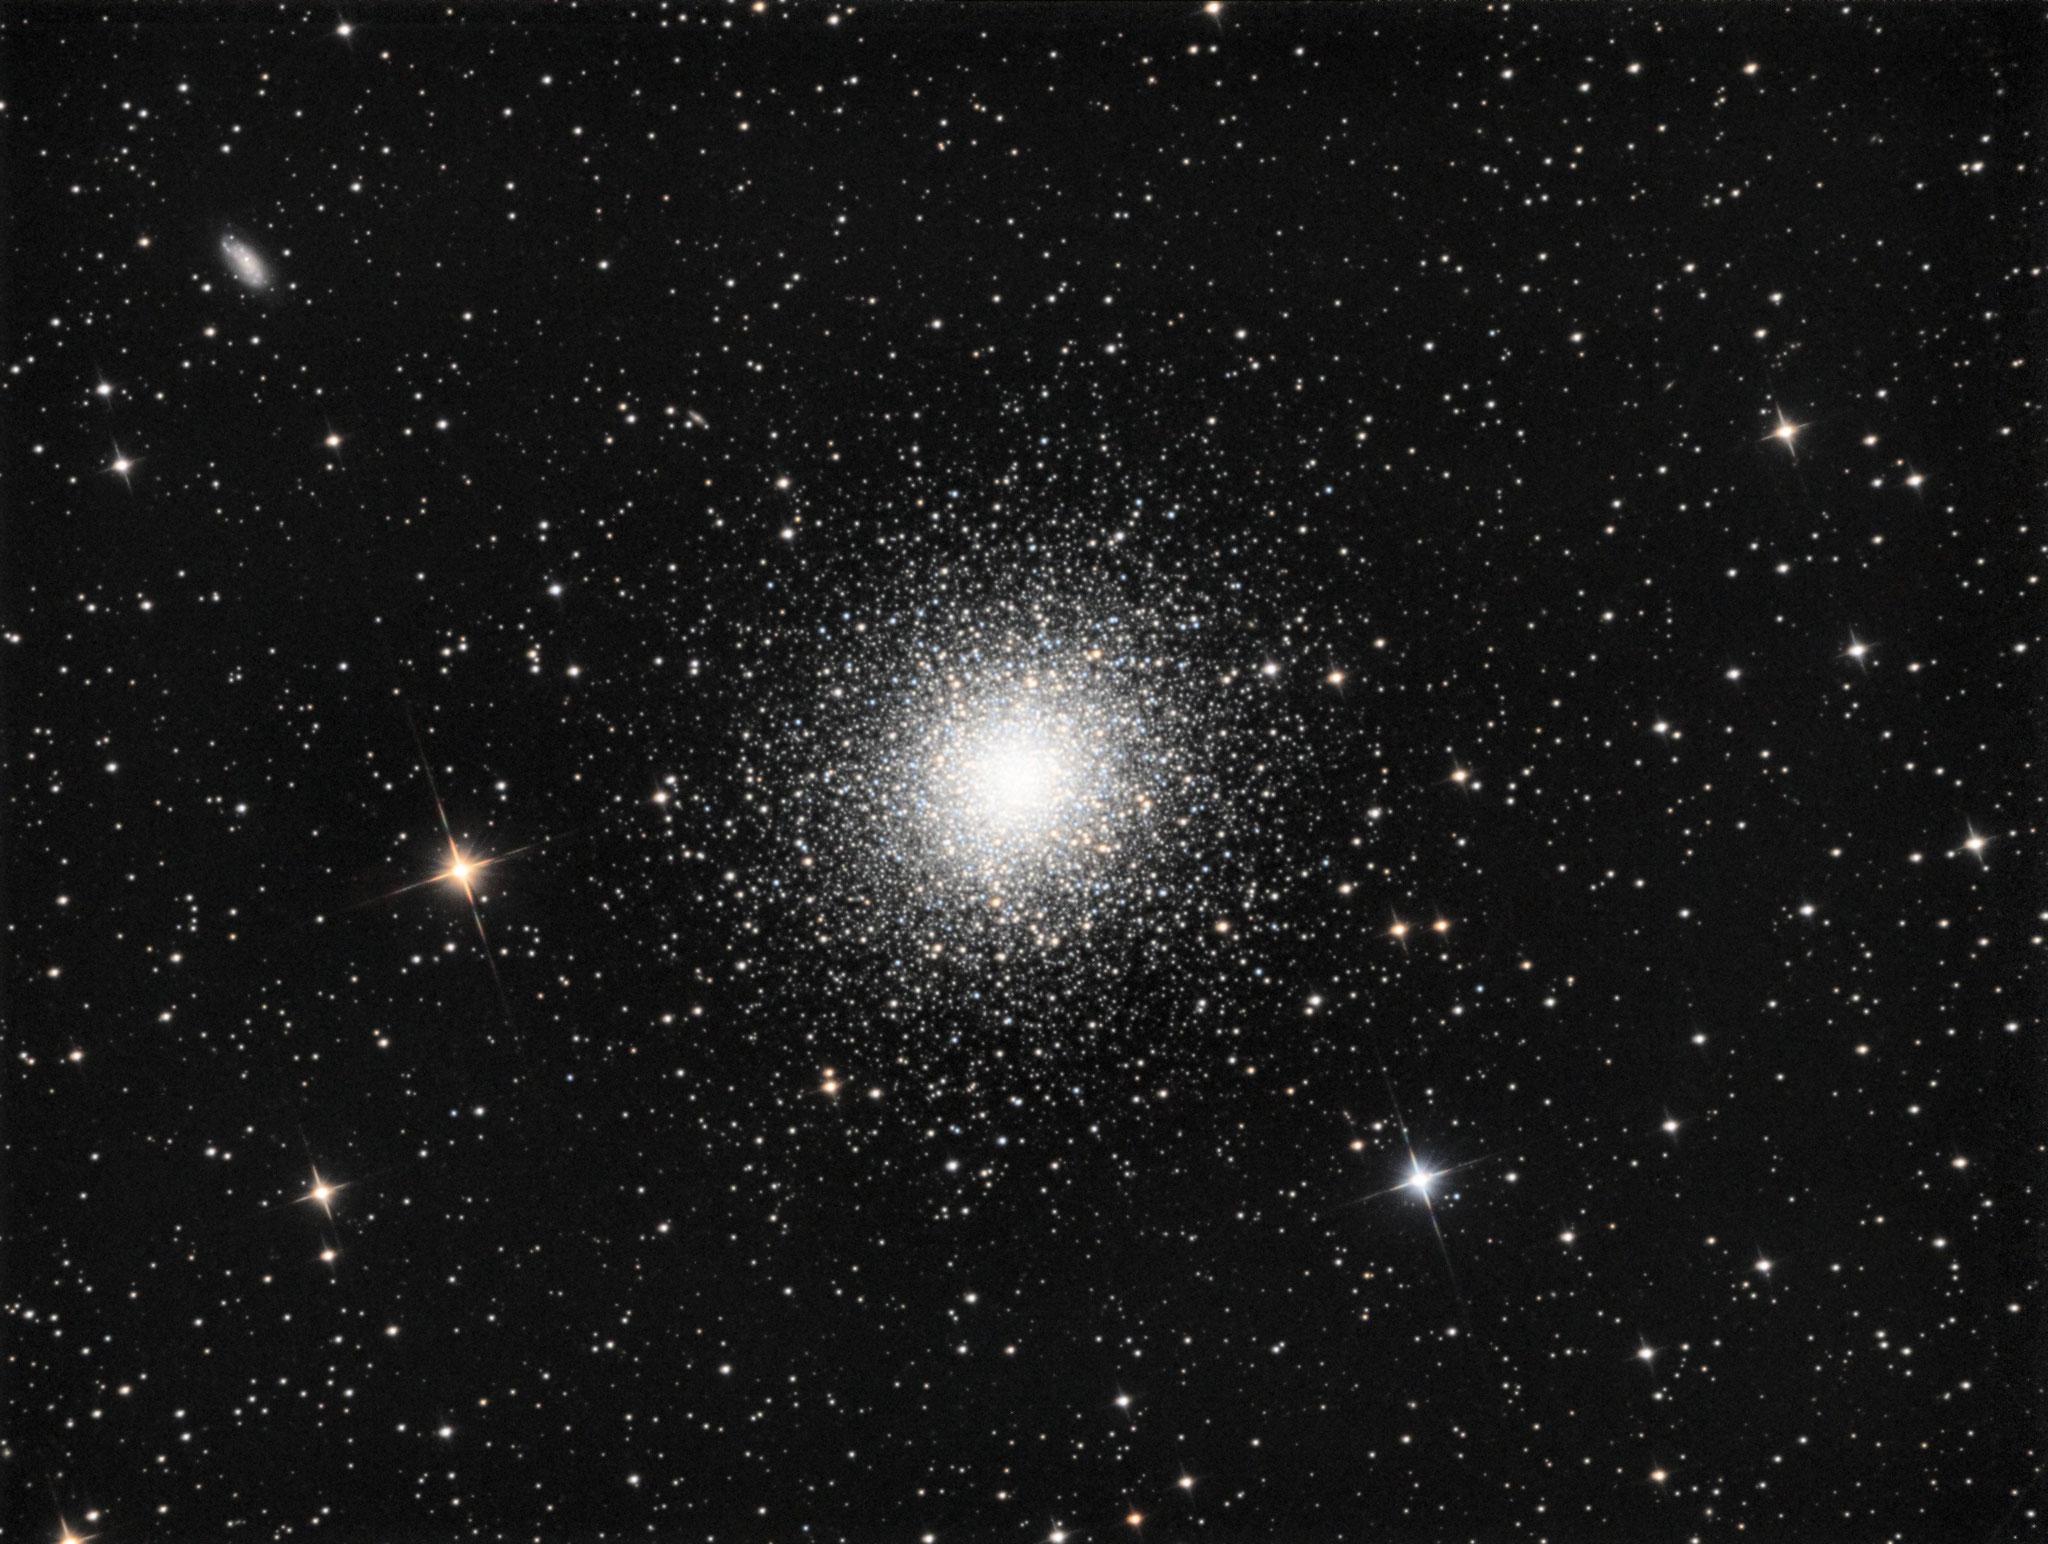 M13, Lum (20x 180s bin1),RVB (10x180s bin1 chaque filtre), 21 septembre 2016, Gilles